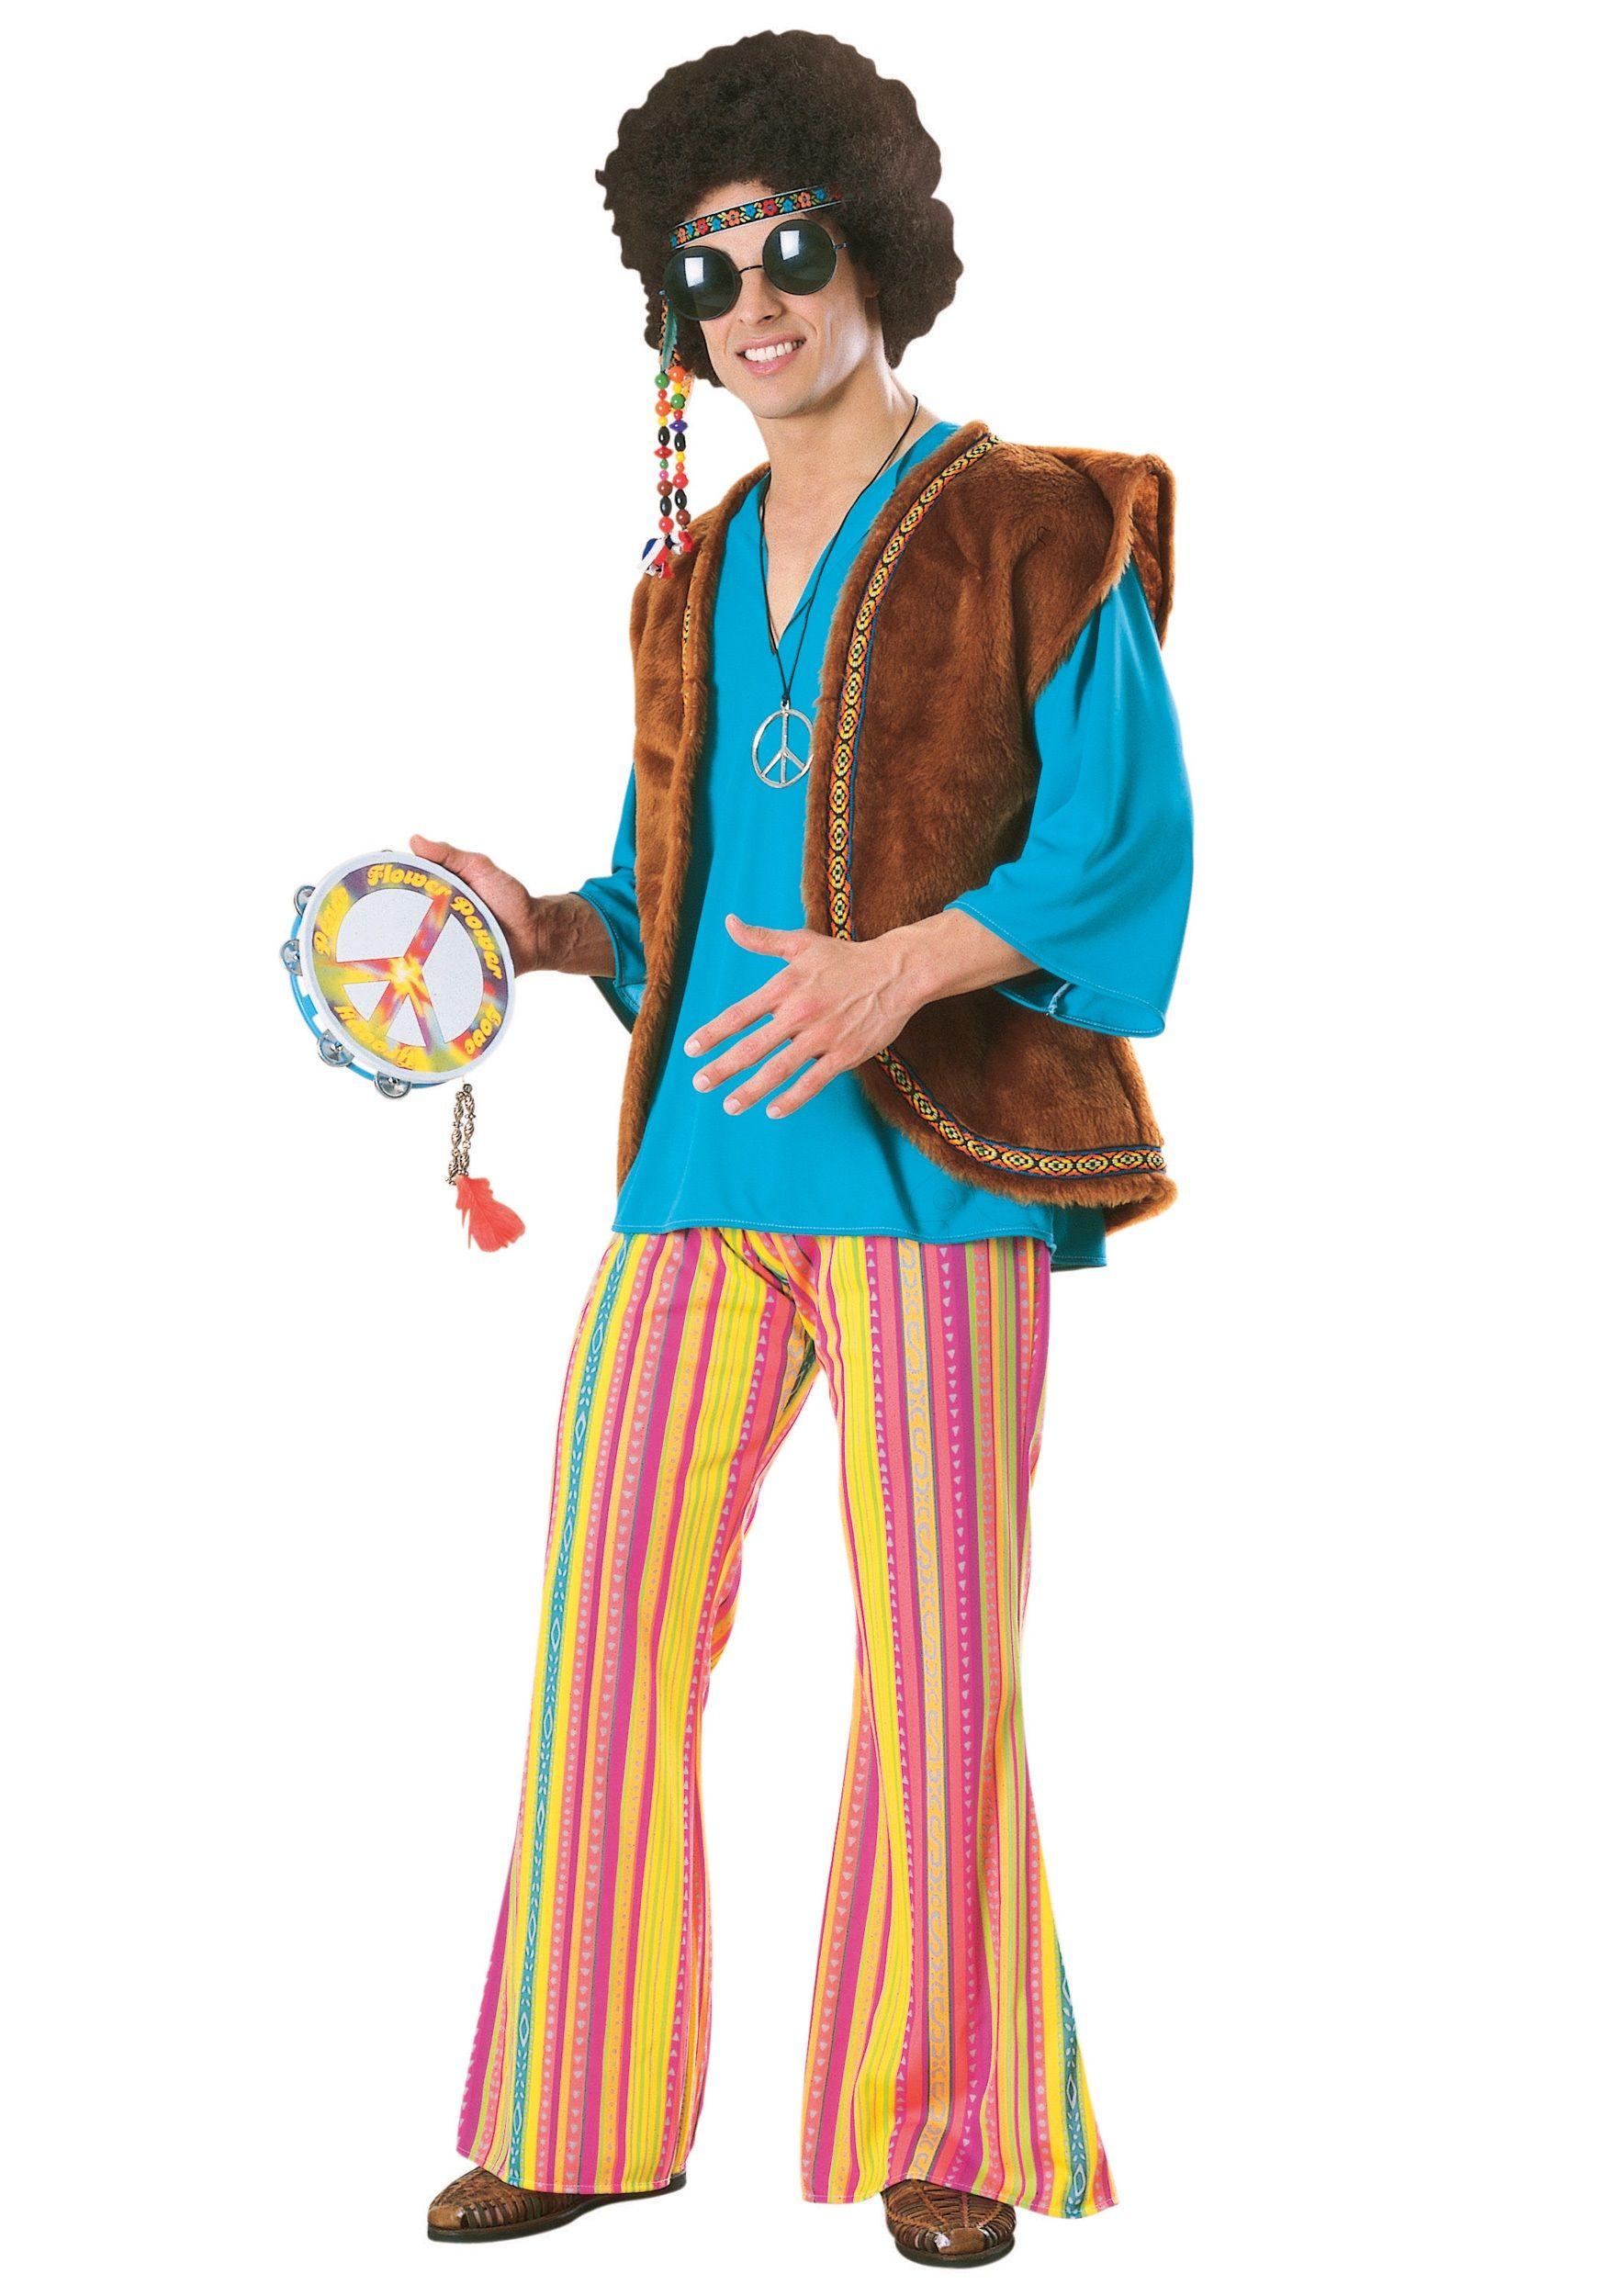 men halloween costume ideas on Costume Ideas Vintage